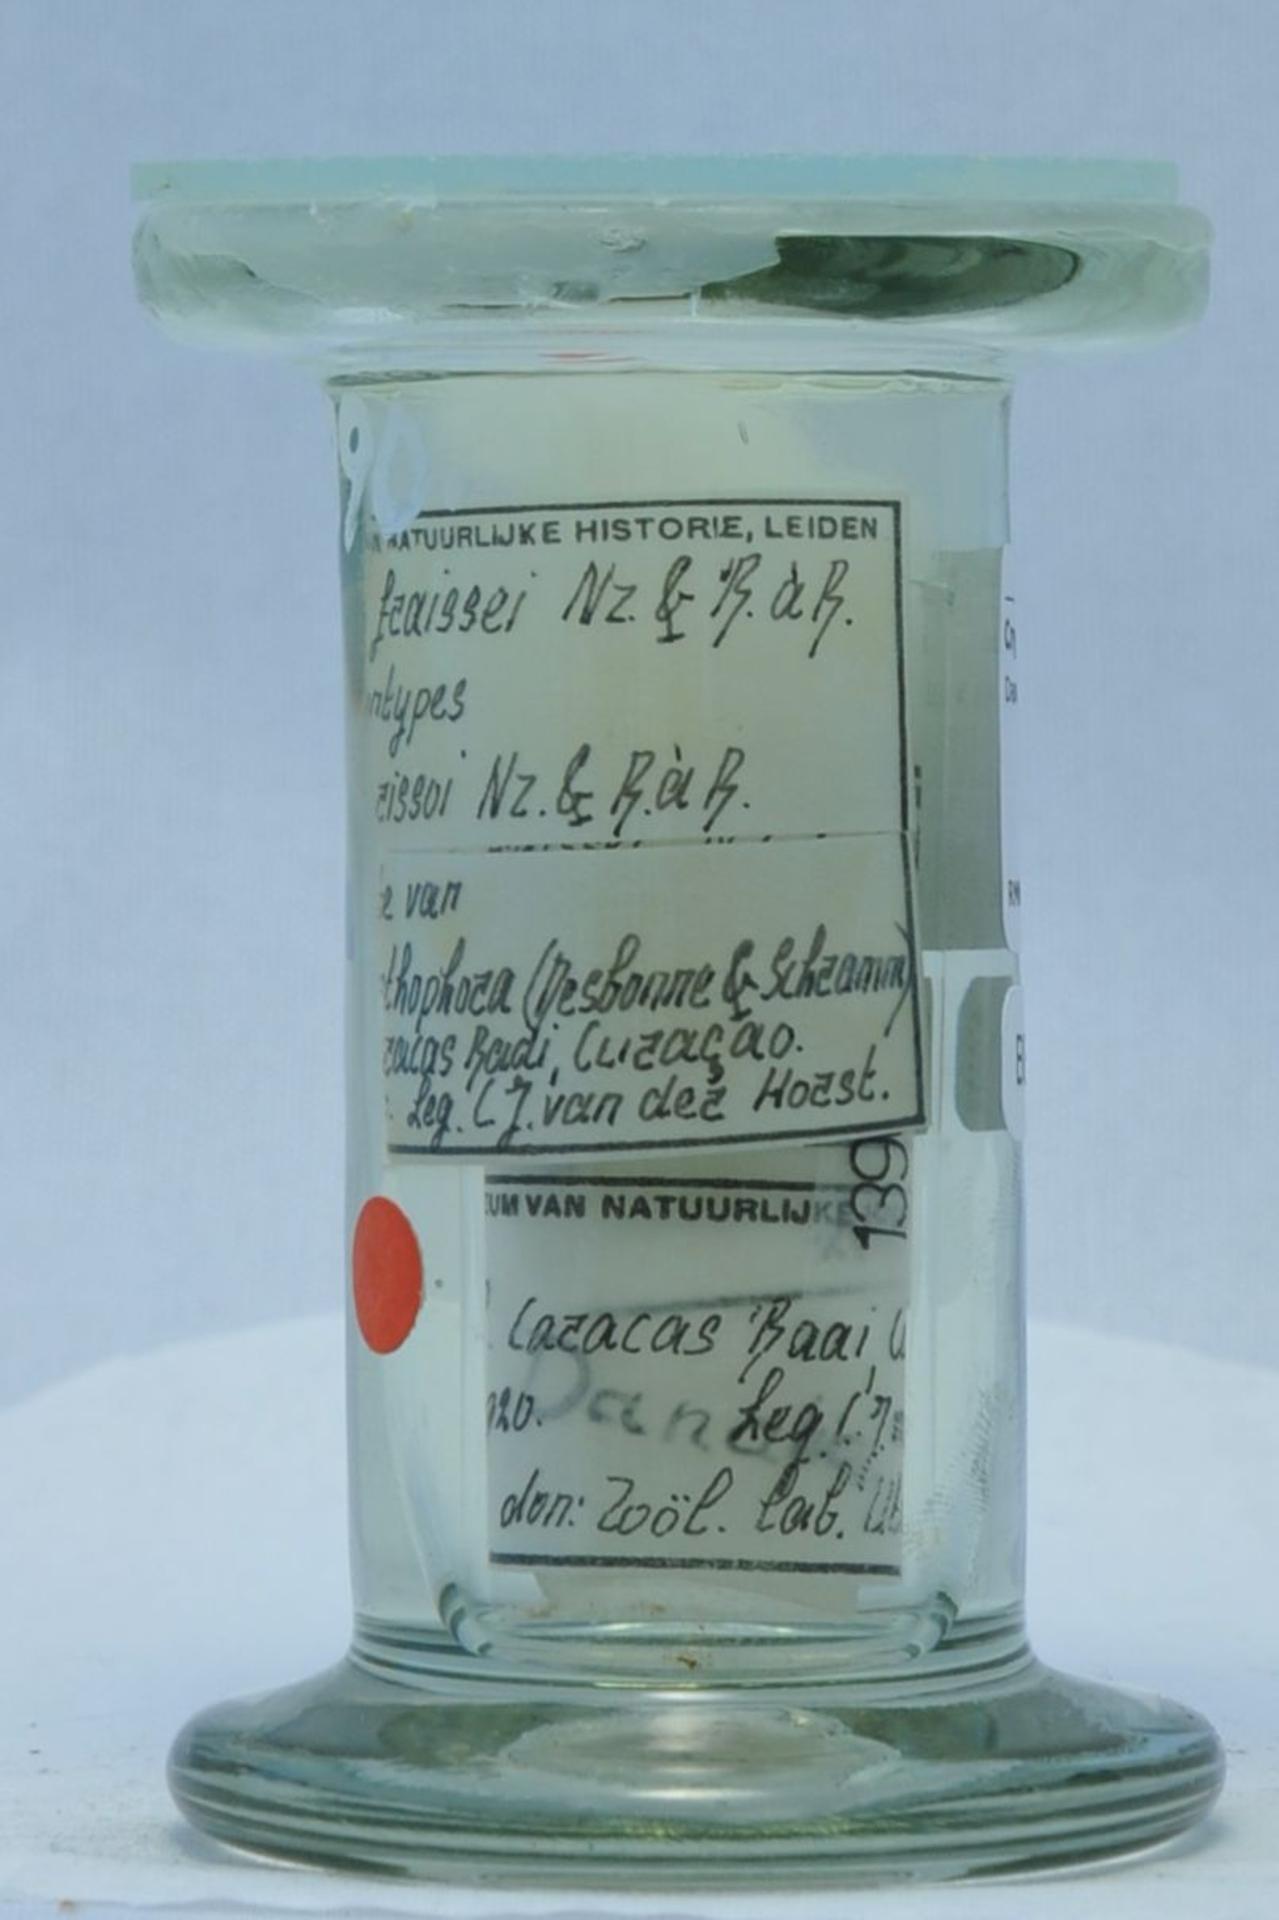 RMNH.CRUS.I.1390 | Danalia fraissei Nierstrasz & Brender à Brandis, 1925